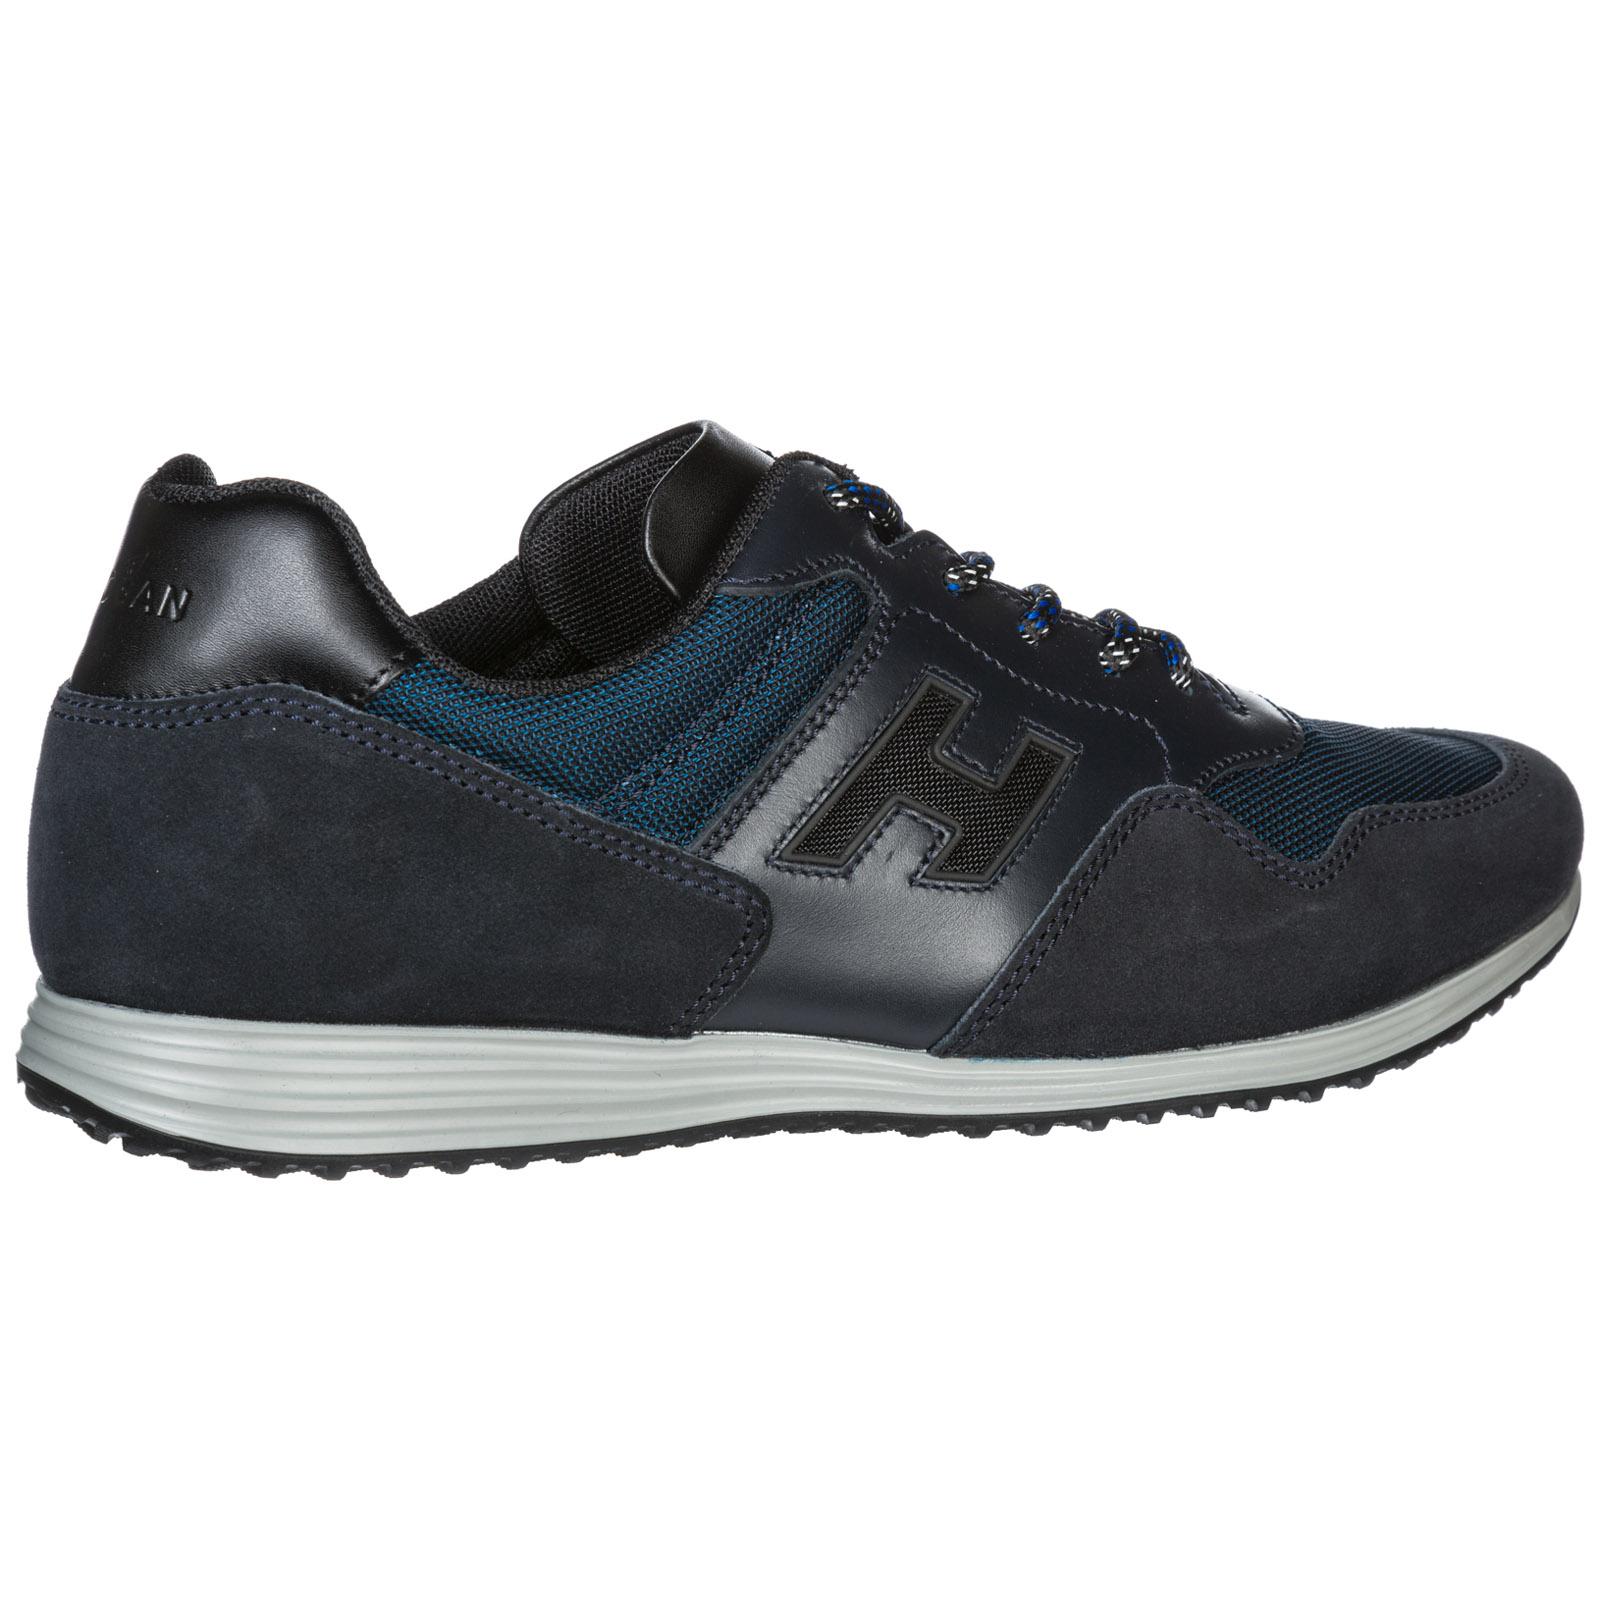 nouvelle arrivee 3b9f7 6756b Chaussures baskets sneakers homme en daim olympia x